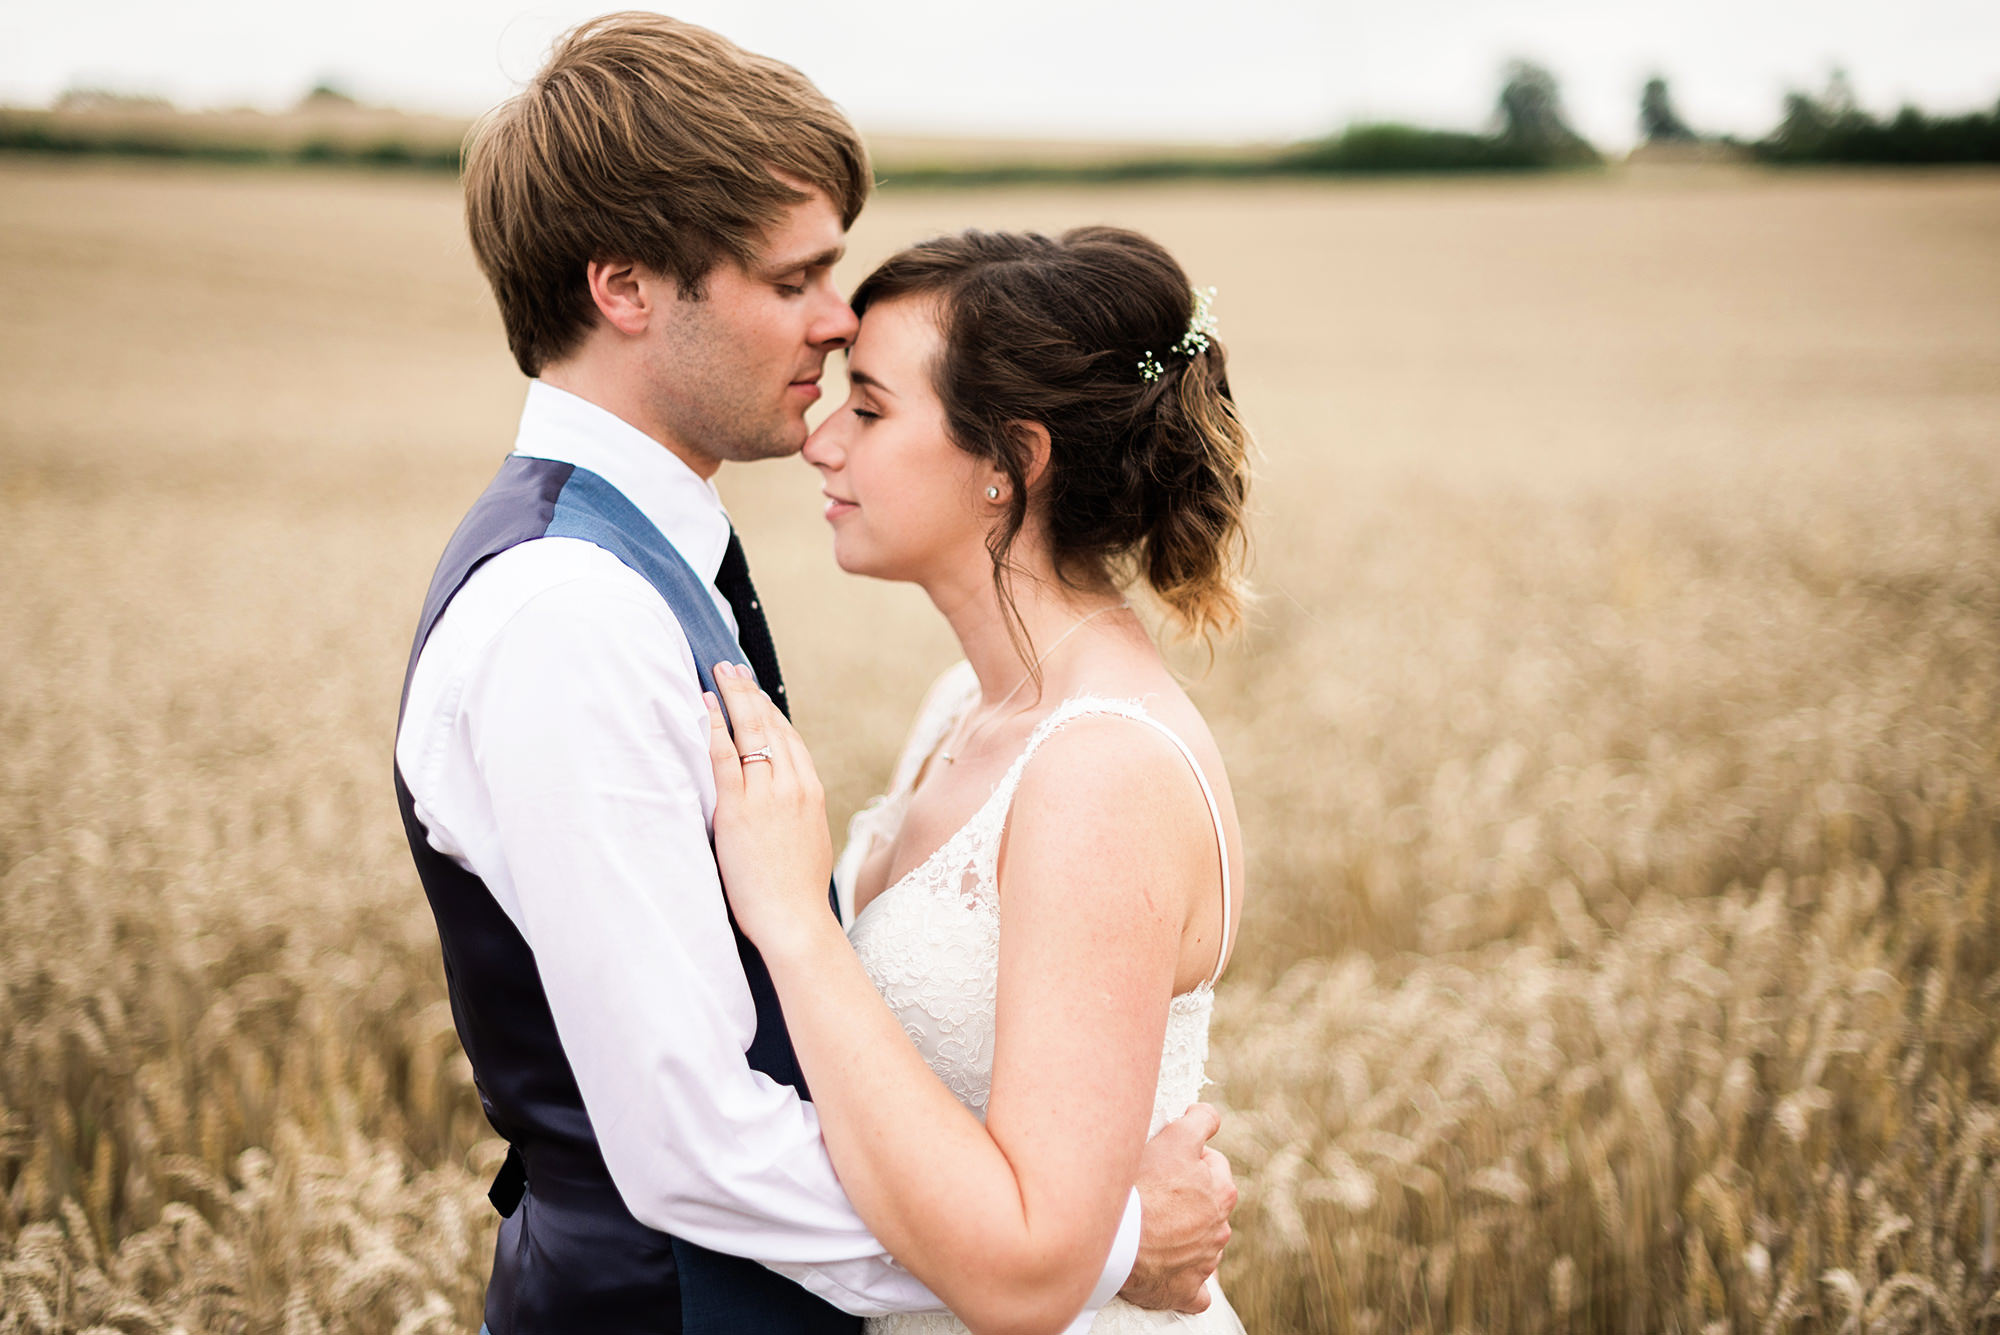 Simon biffen-best of 2015 wedding photographs-16